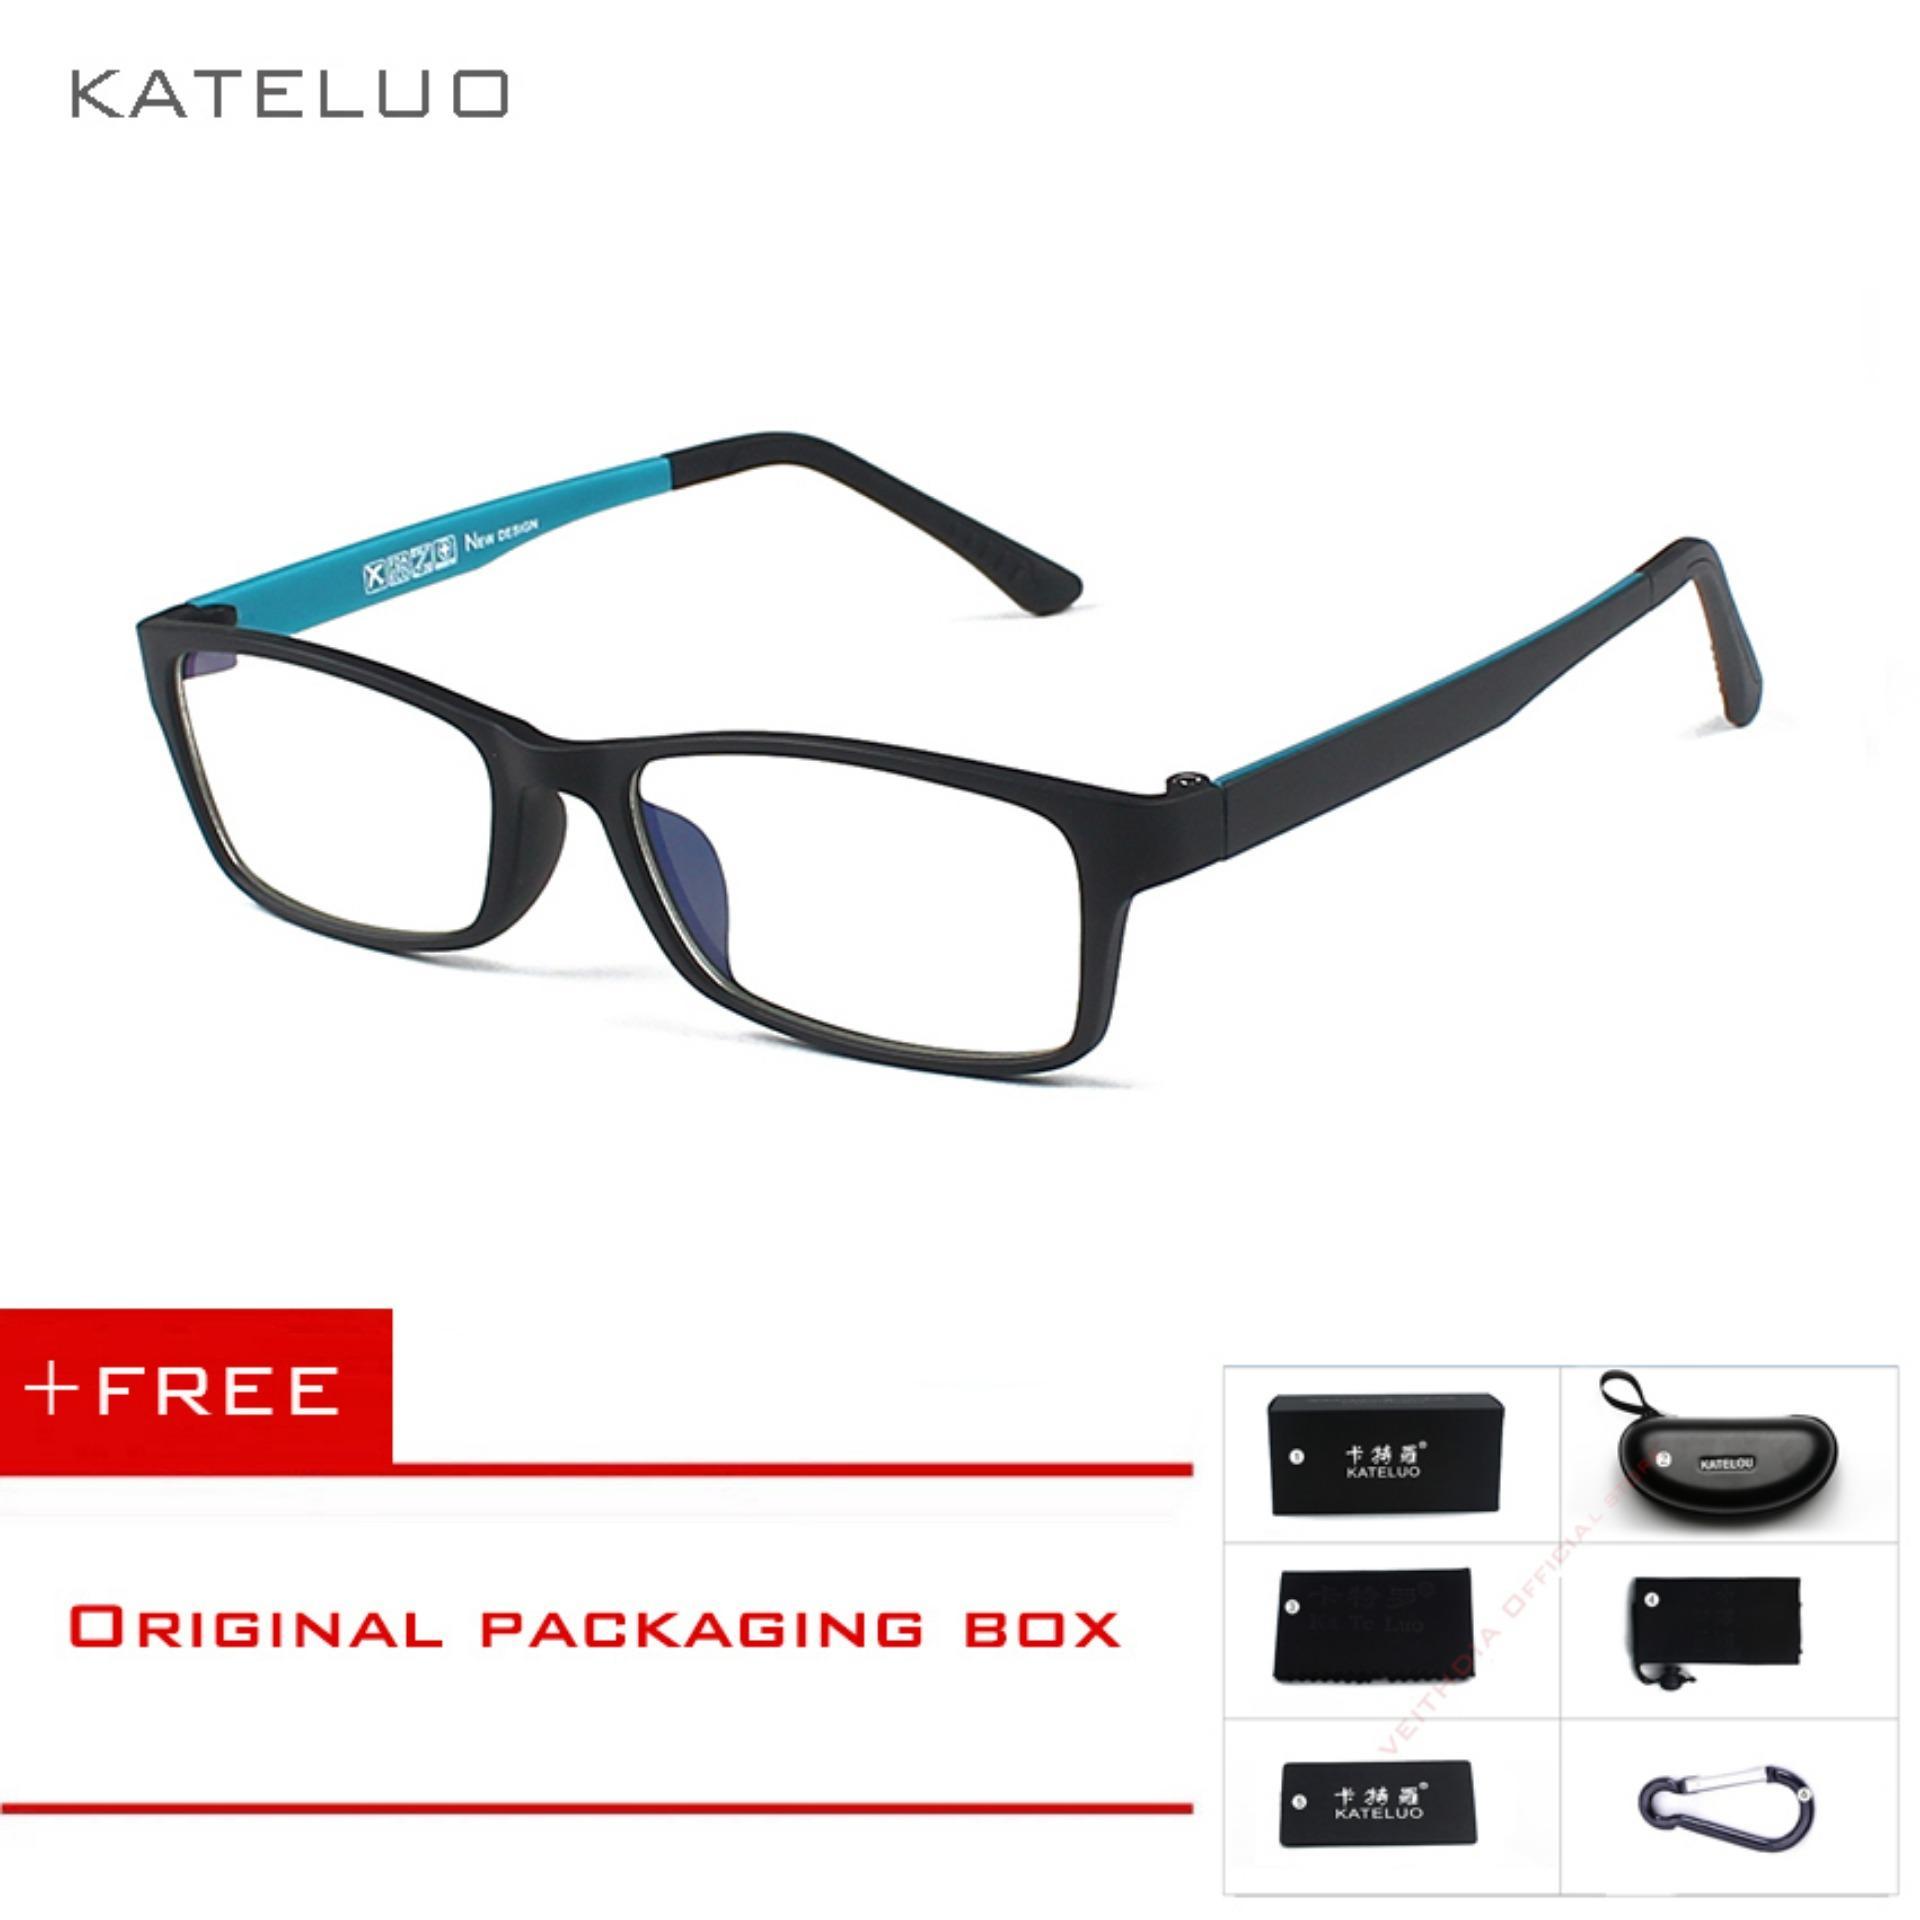 COD+Pengiriman Gratis KATELUO Kacamata Radiasi Kacamat Komputer Anti Lelah  Untuk Pria Wanita 1302 156c8acfe3